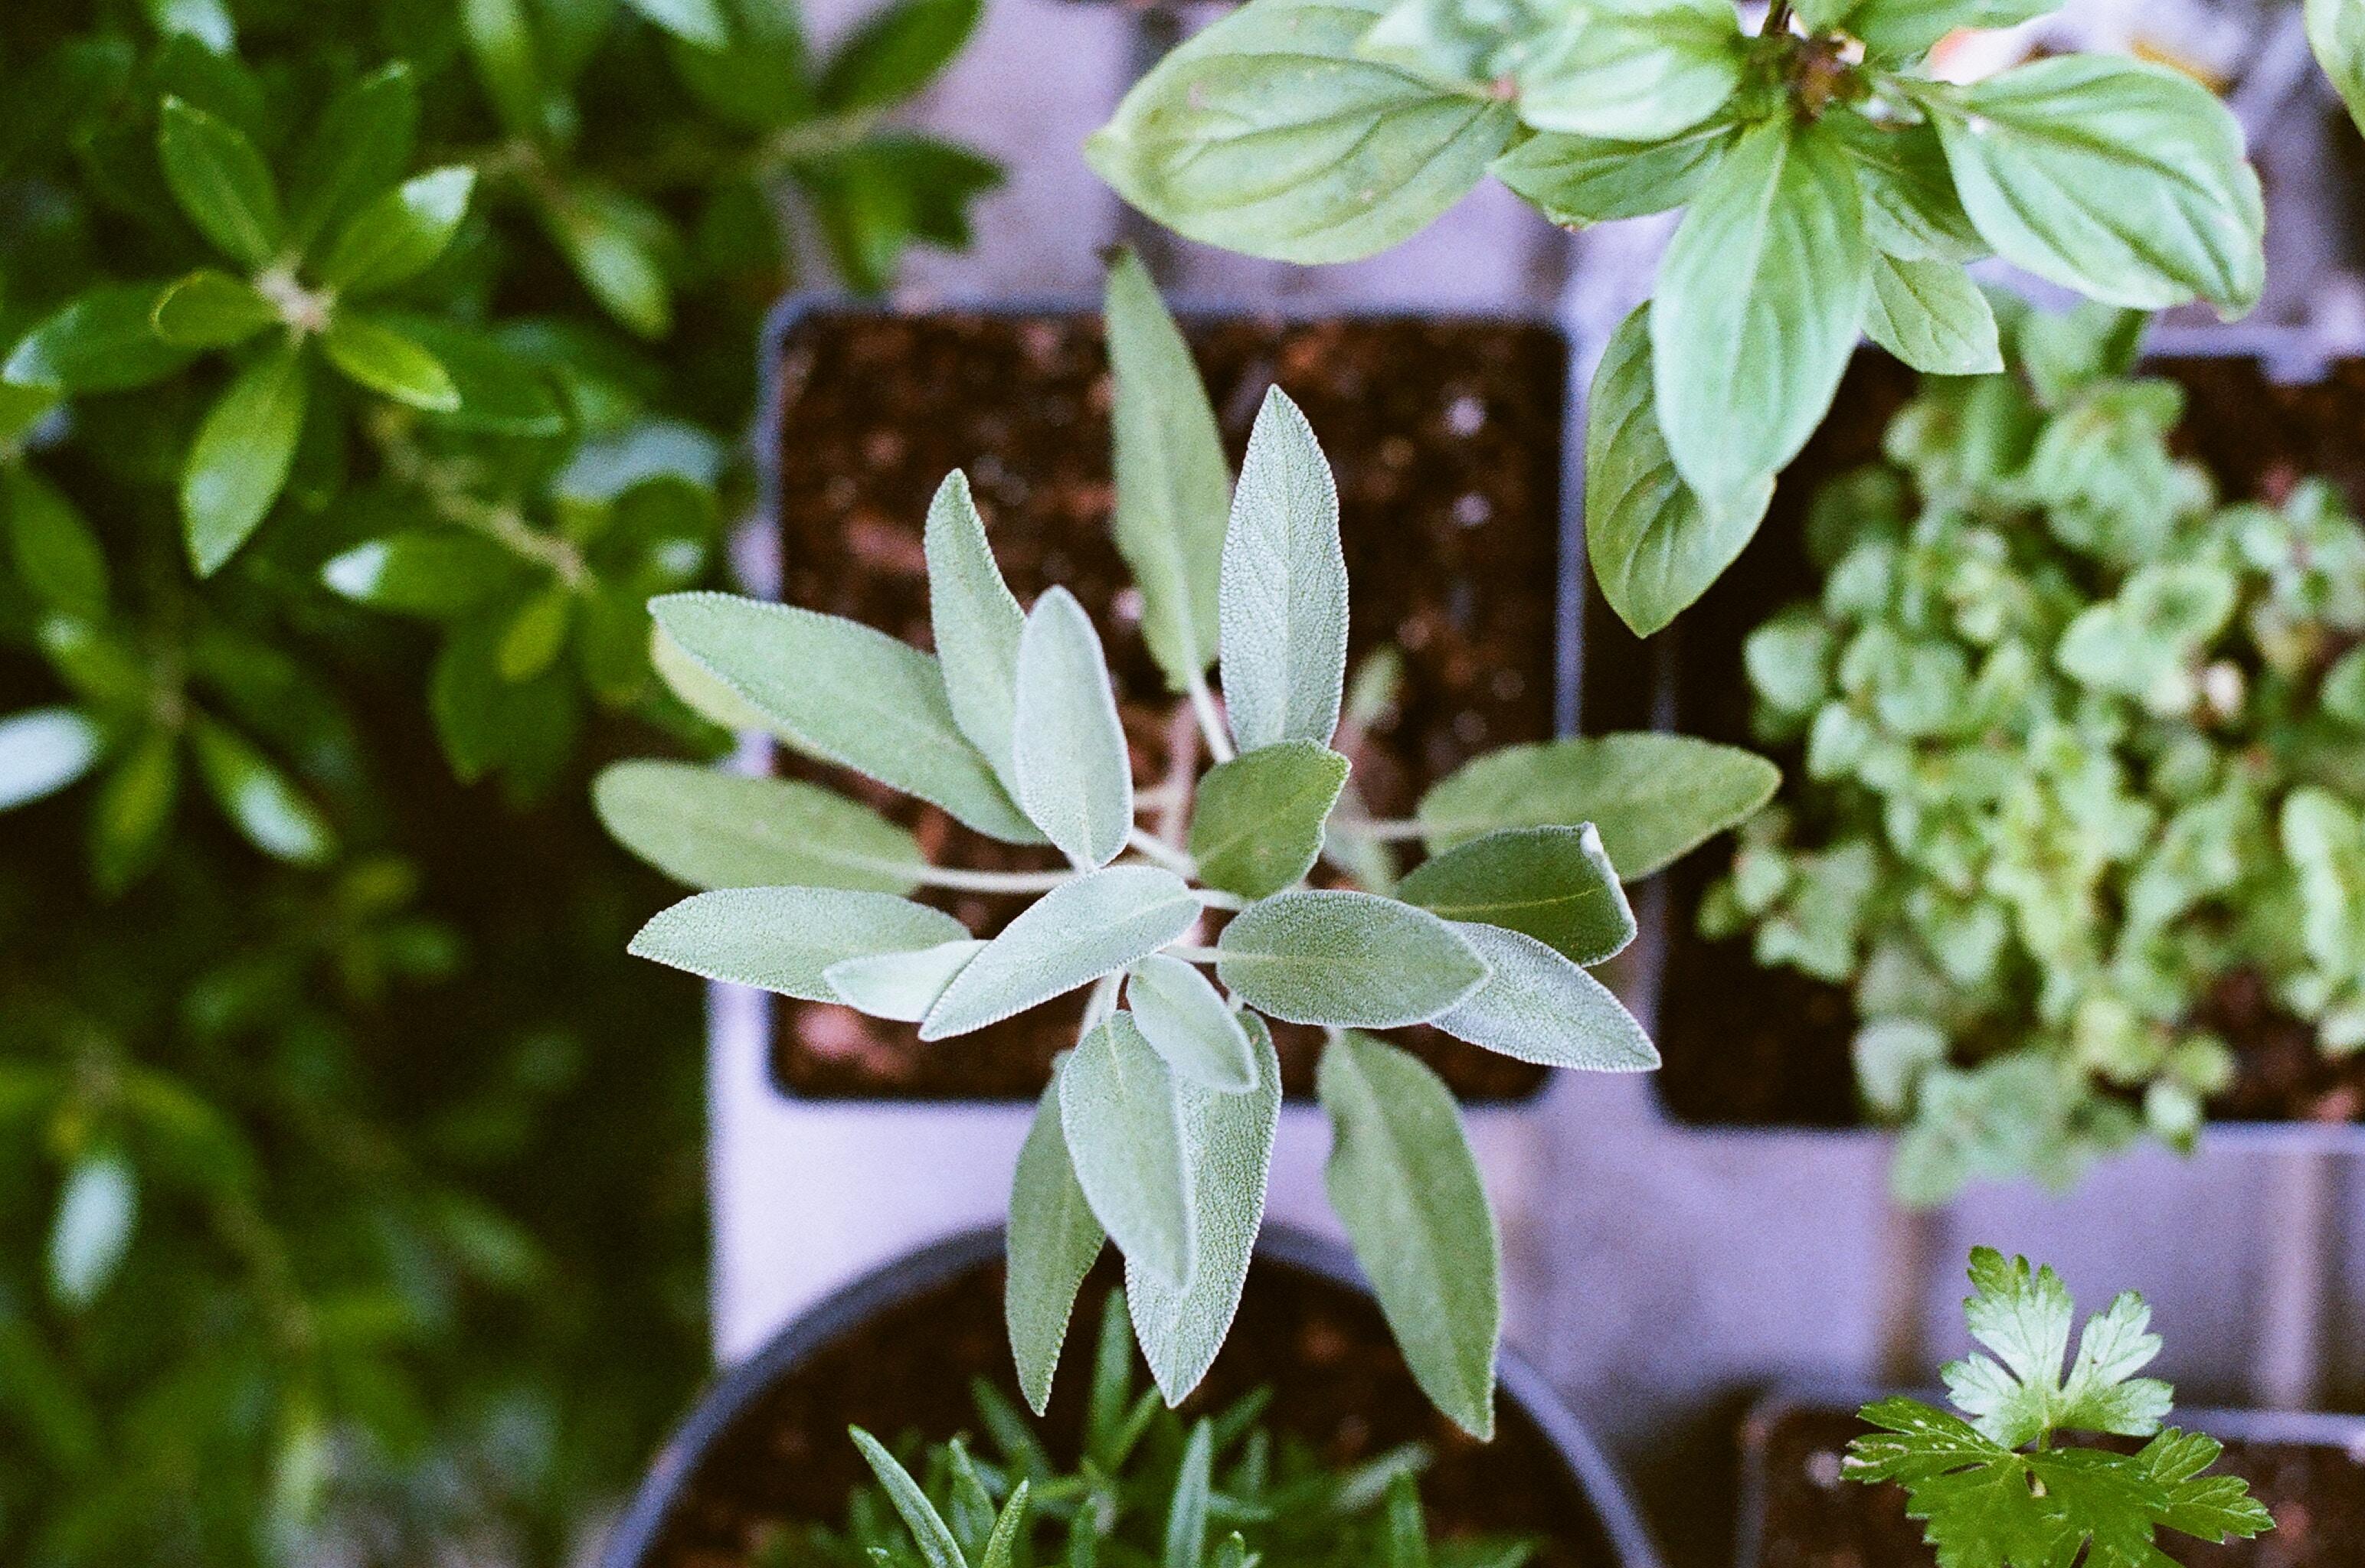 Salads, Sprouting & Herbs workshop demos